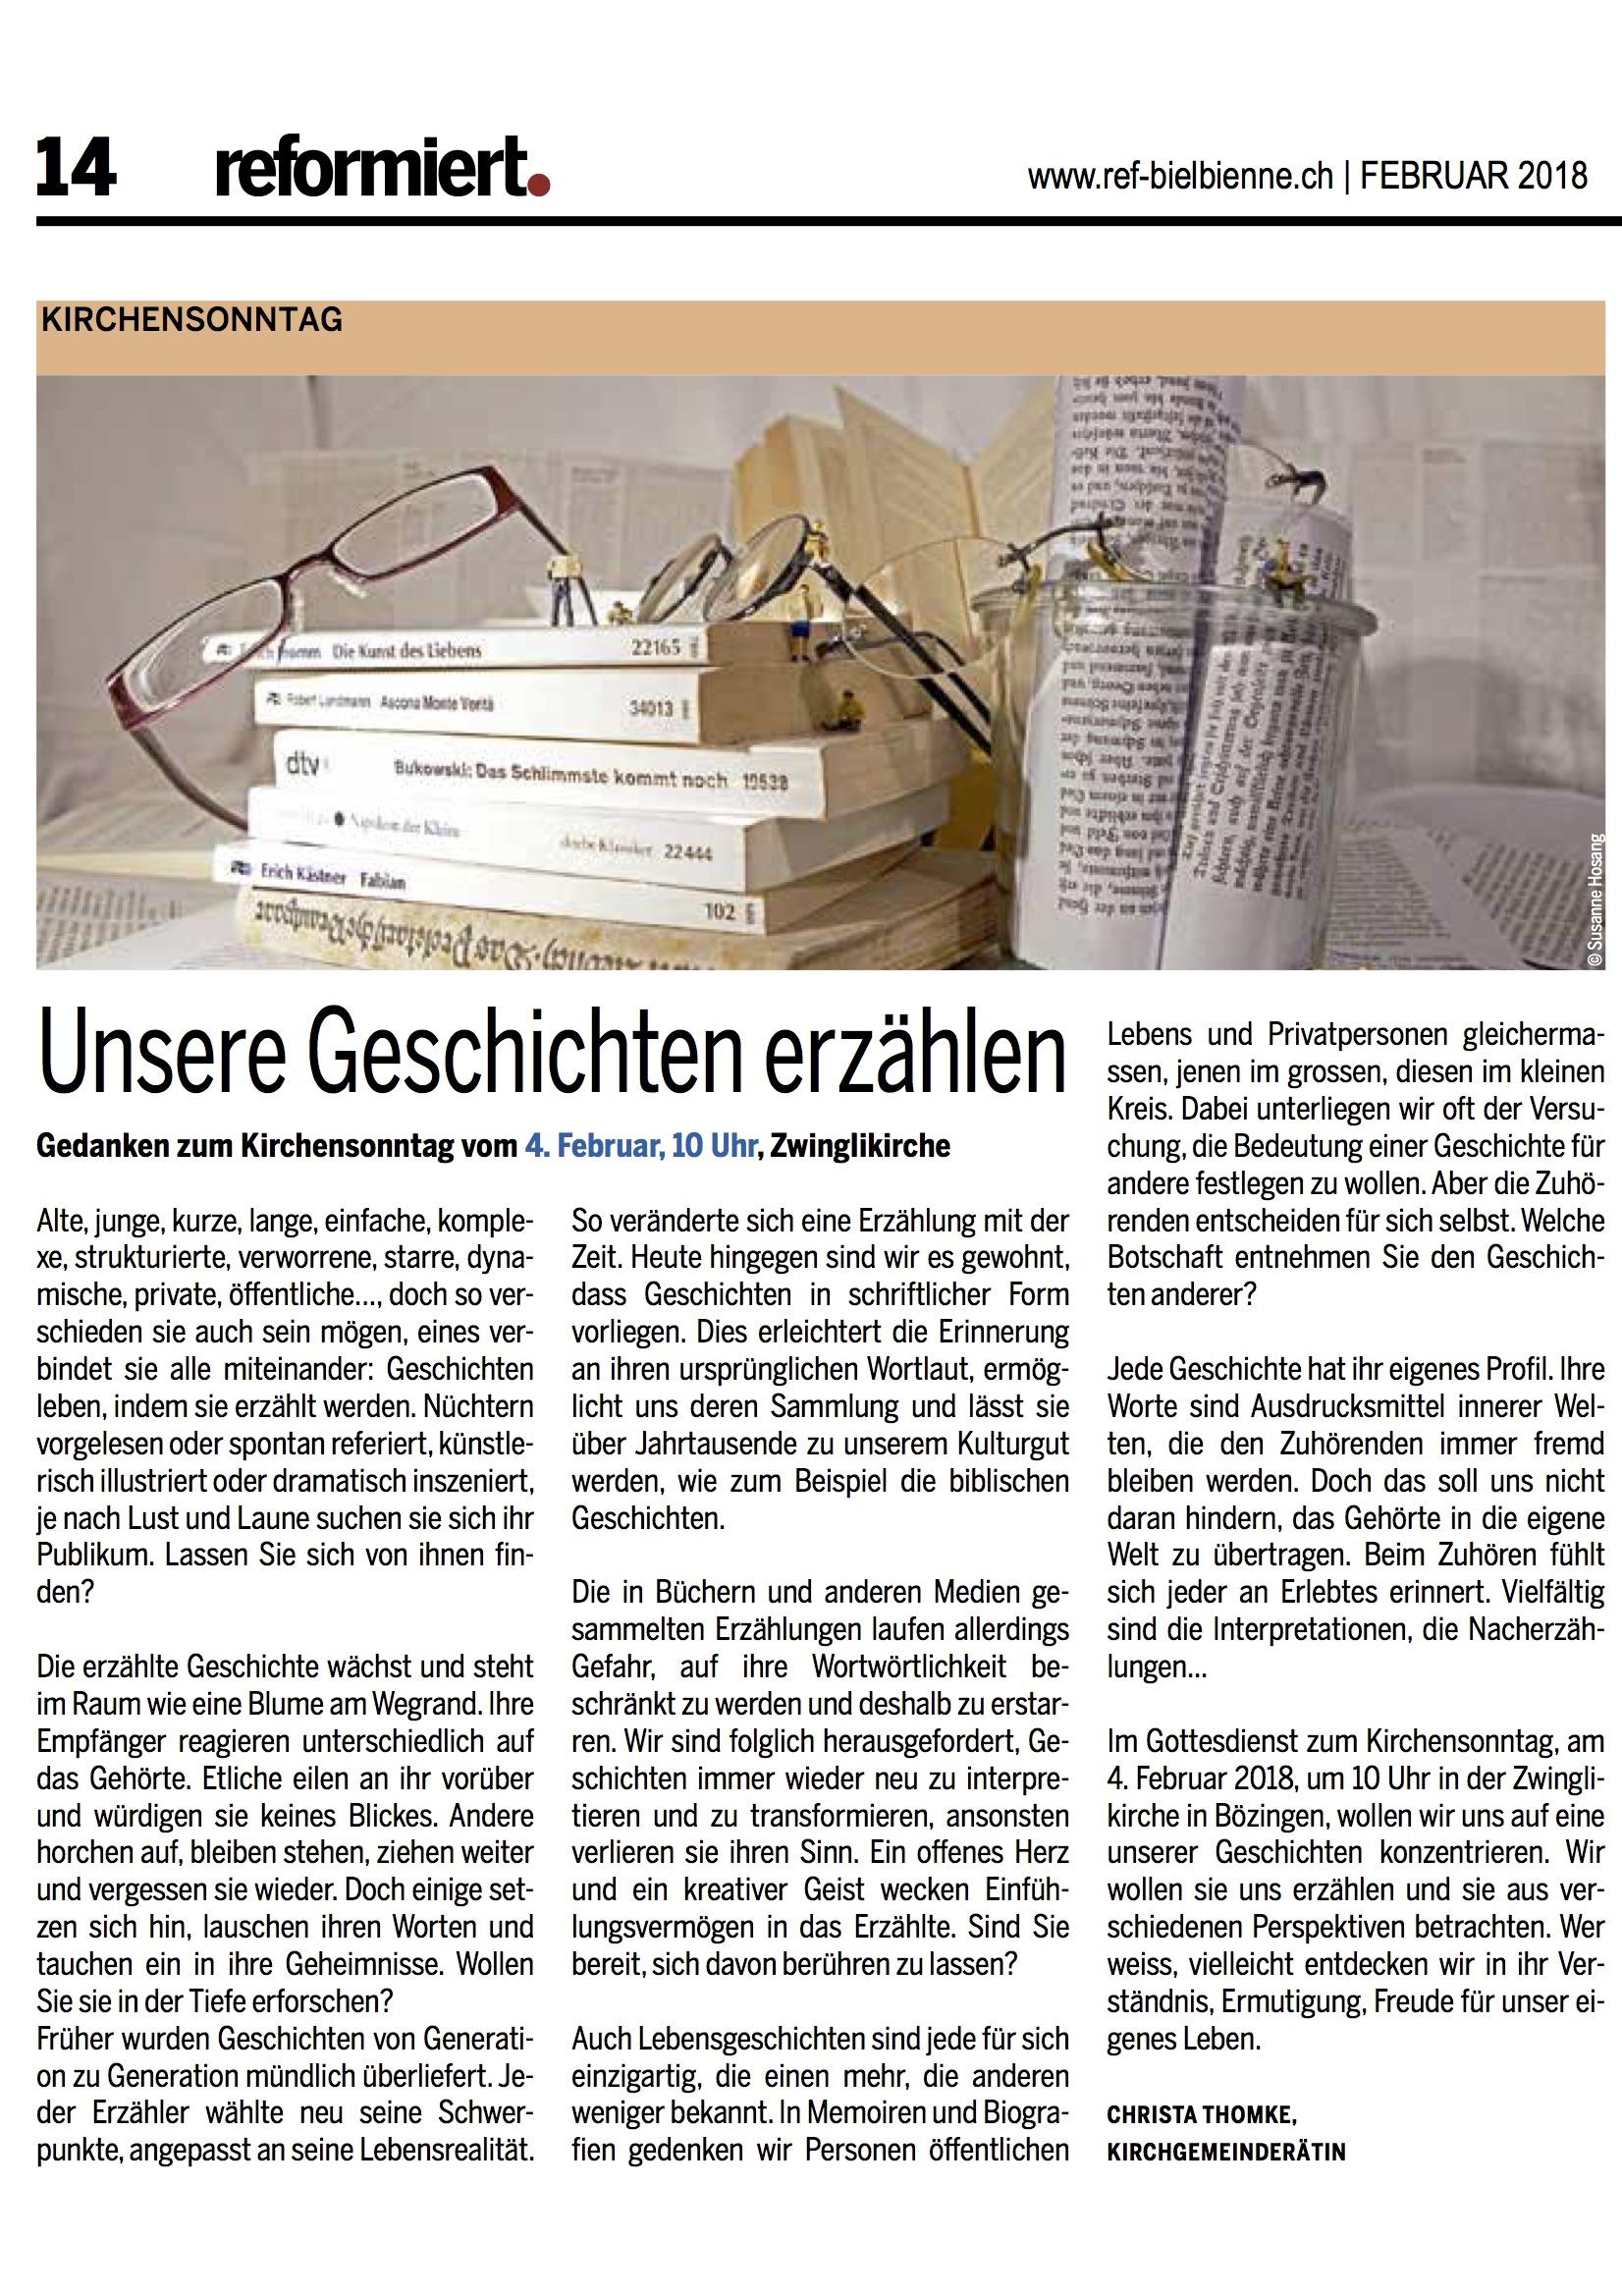 © reformiert. (Bieler Ausgabe), Februar 2018, S. 14